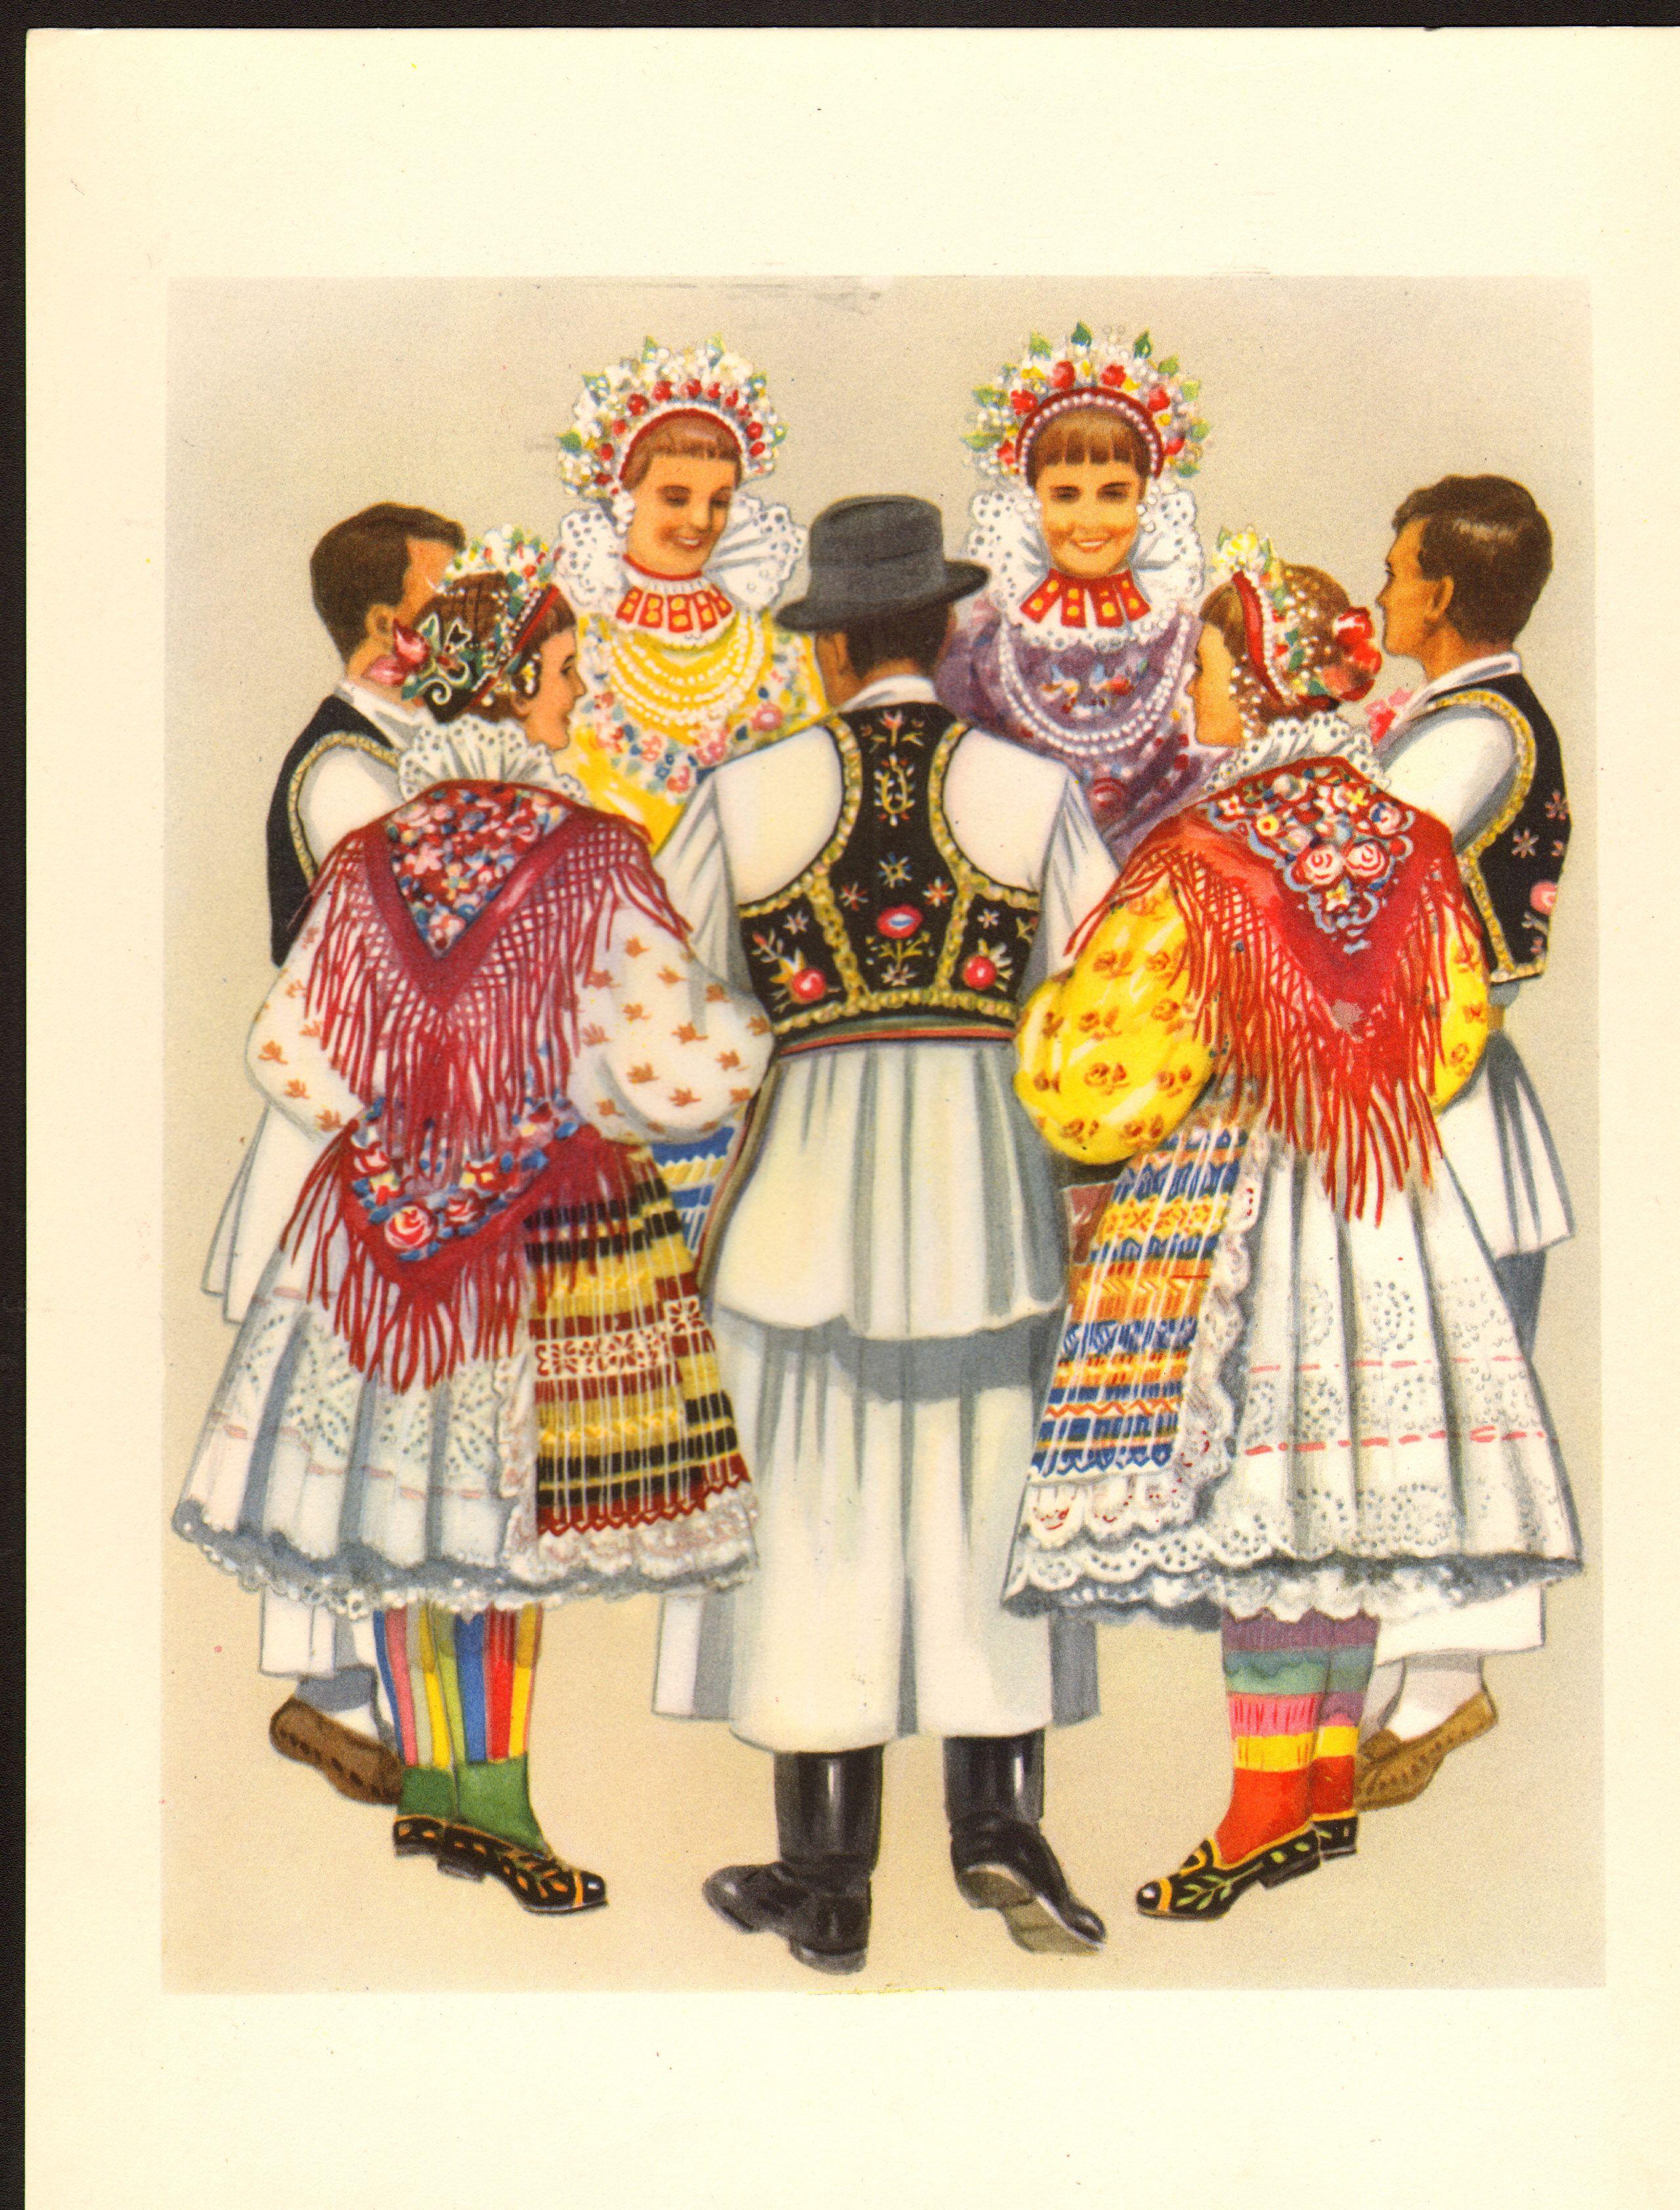 Hrvatska Drmes Valpovo Brođanci Kroatie Folklore